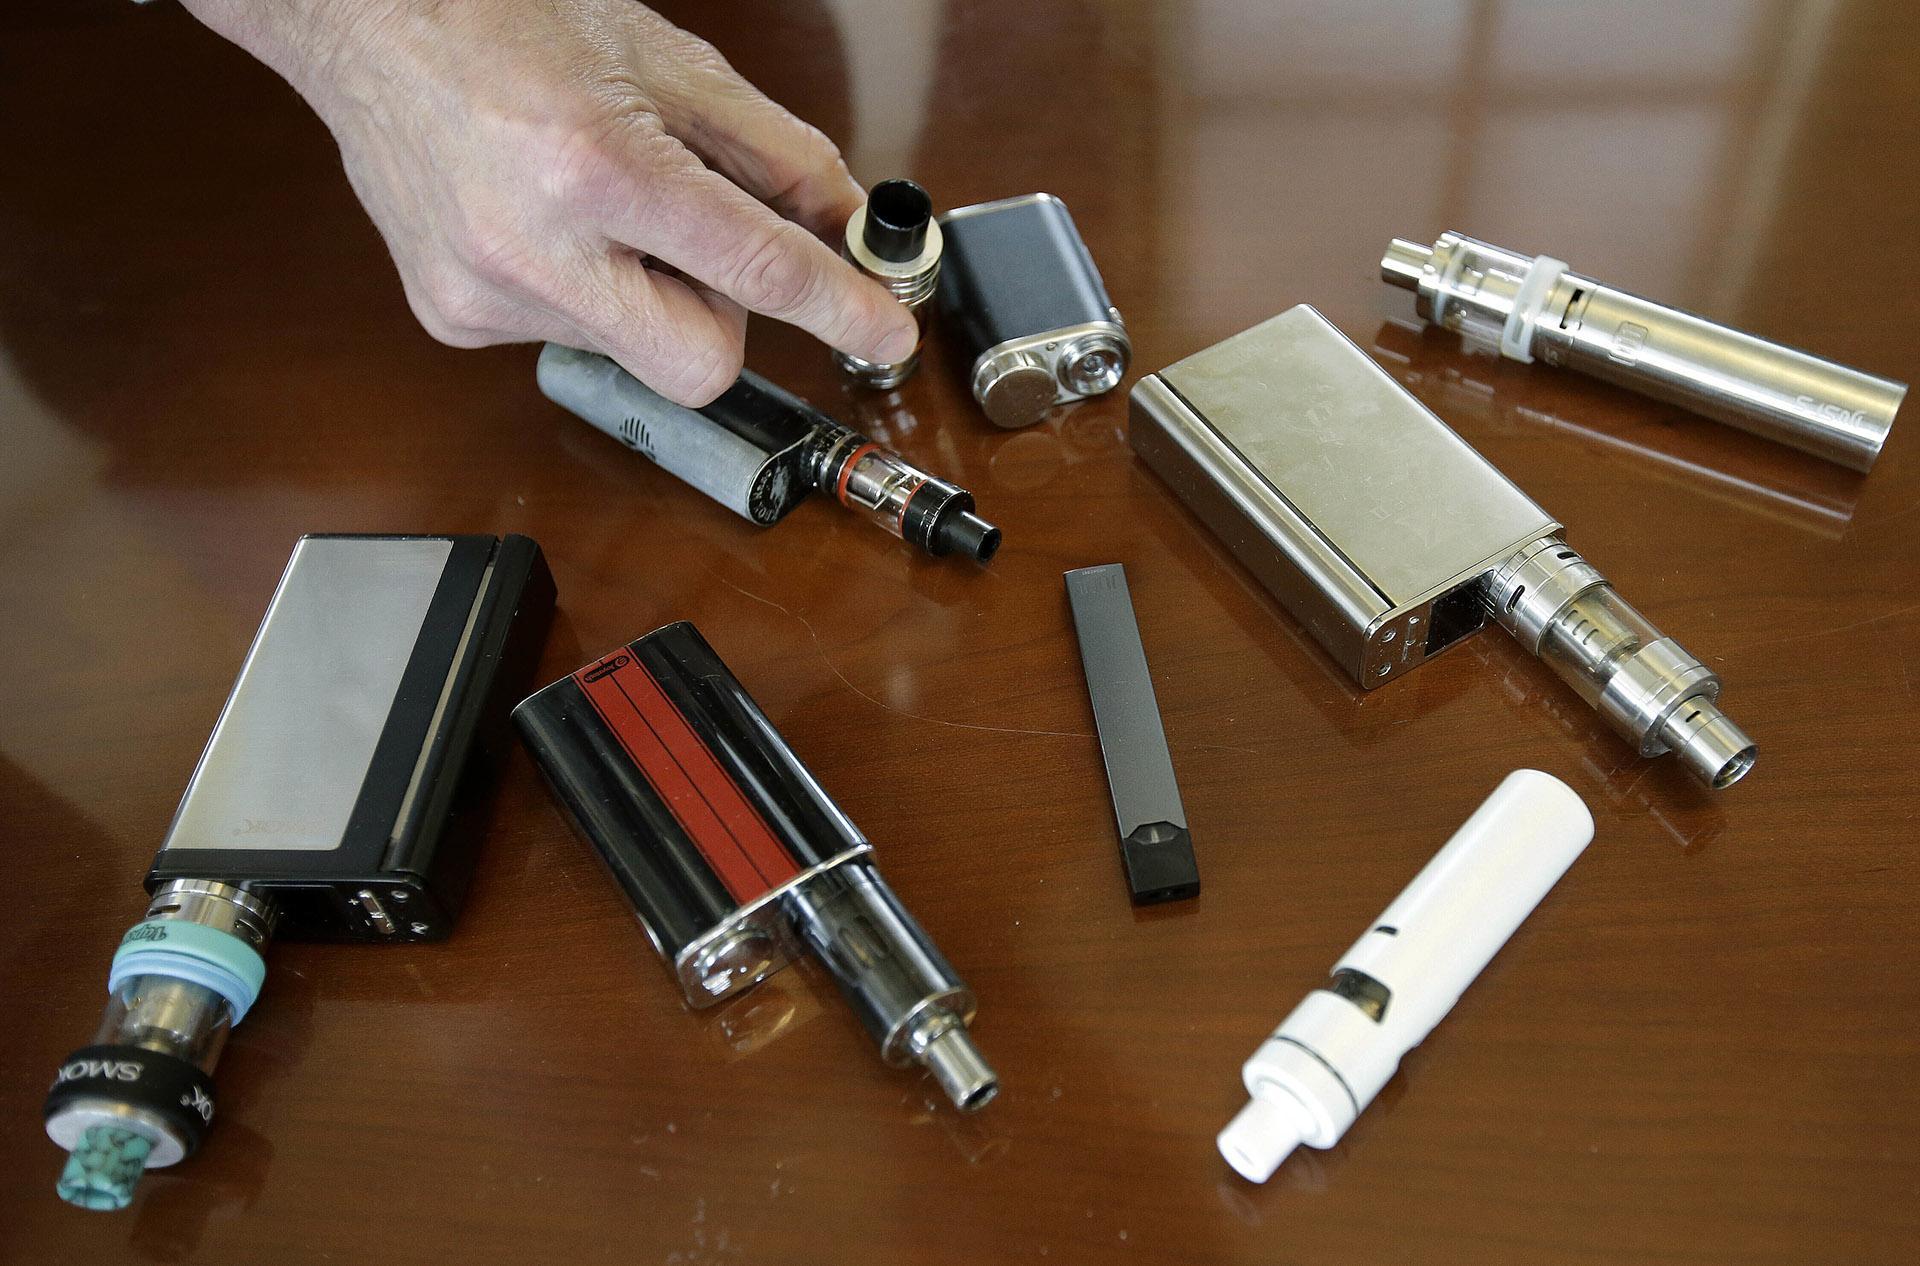 vaping companies sue to